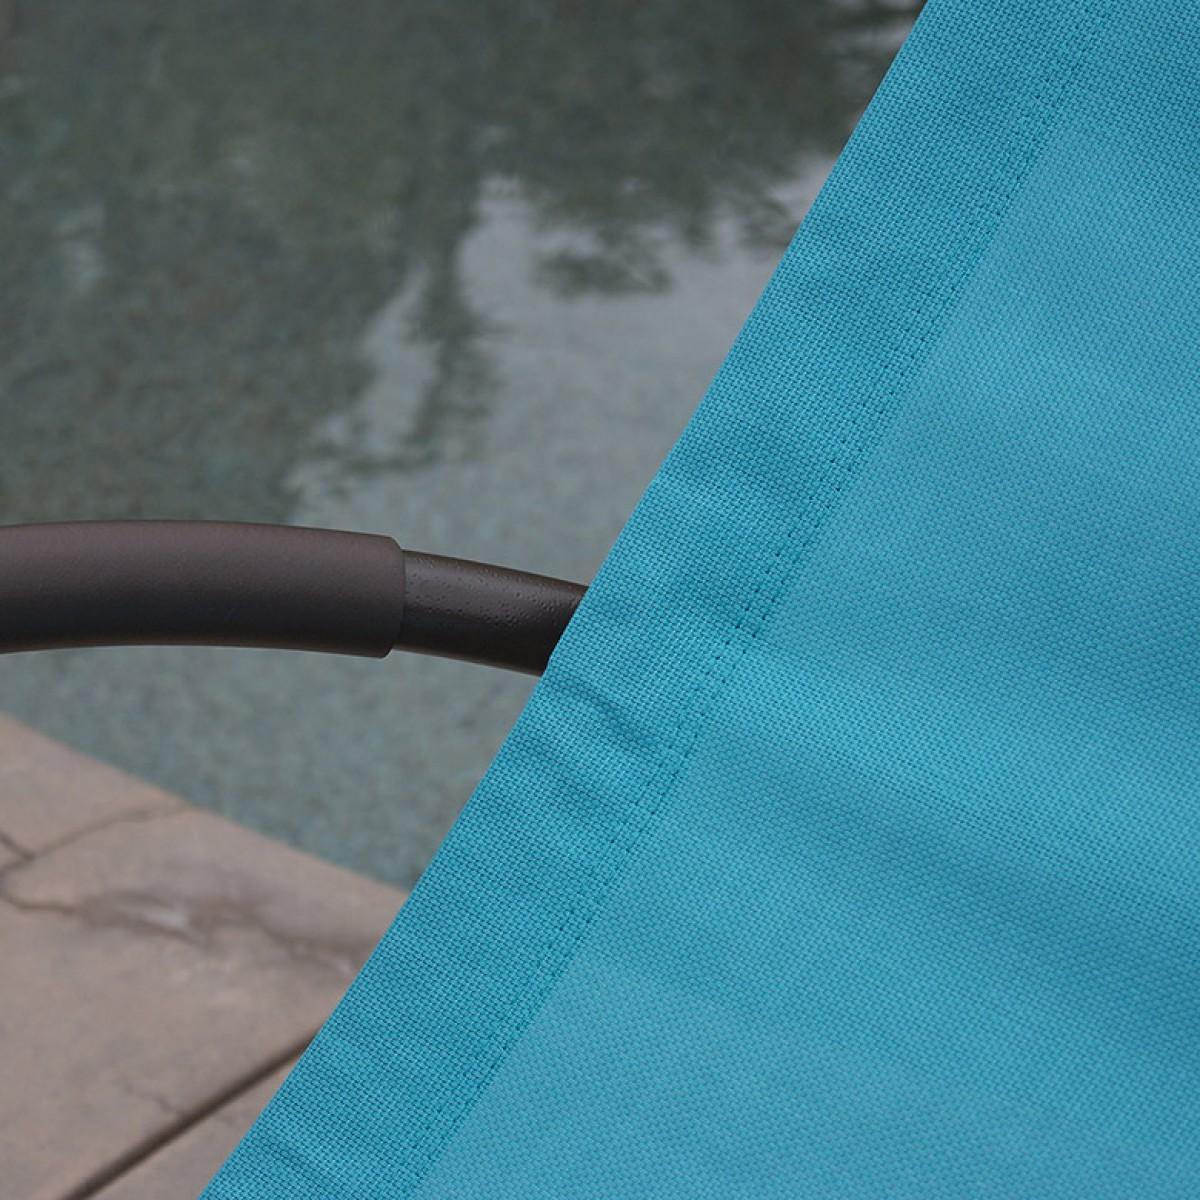 Orbital Lounger | Pool Lounger | Orbit Lounger Replacement Cushion